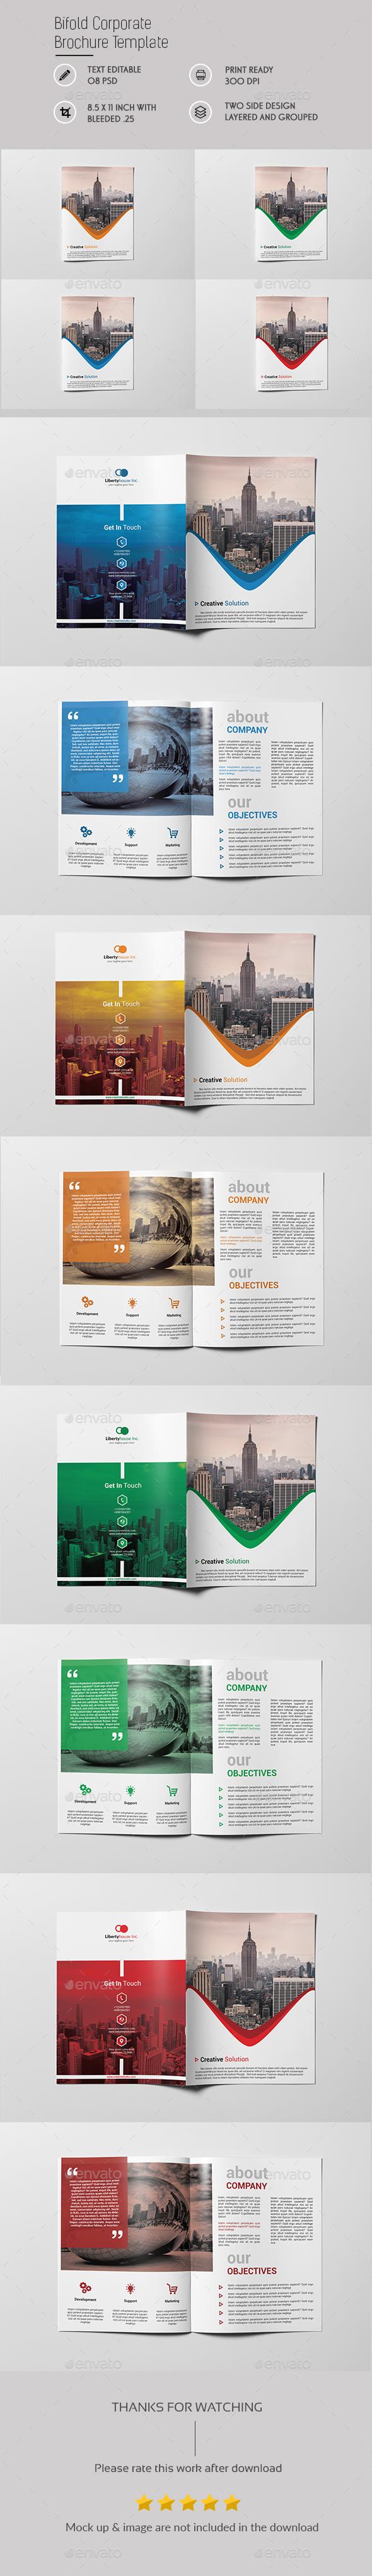 Corporate Bi fold Brochure Template - Brochures Print Templates